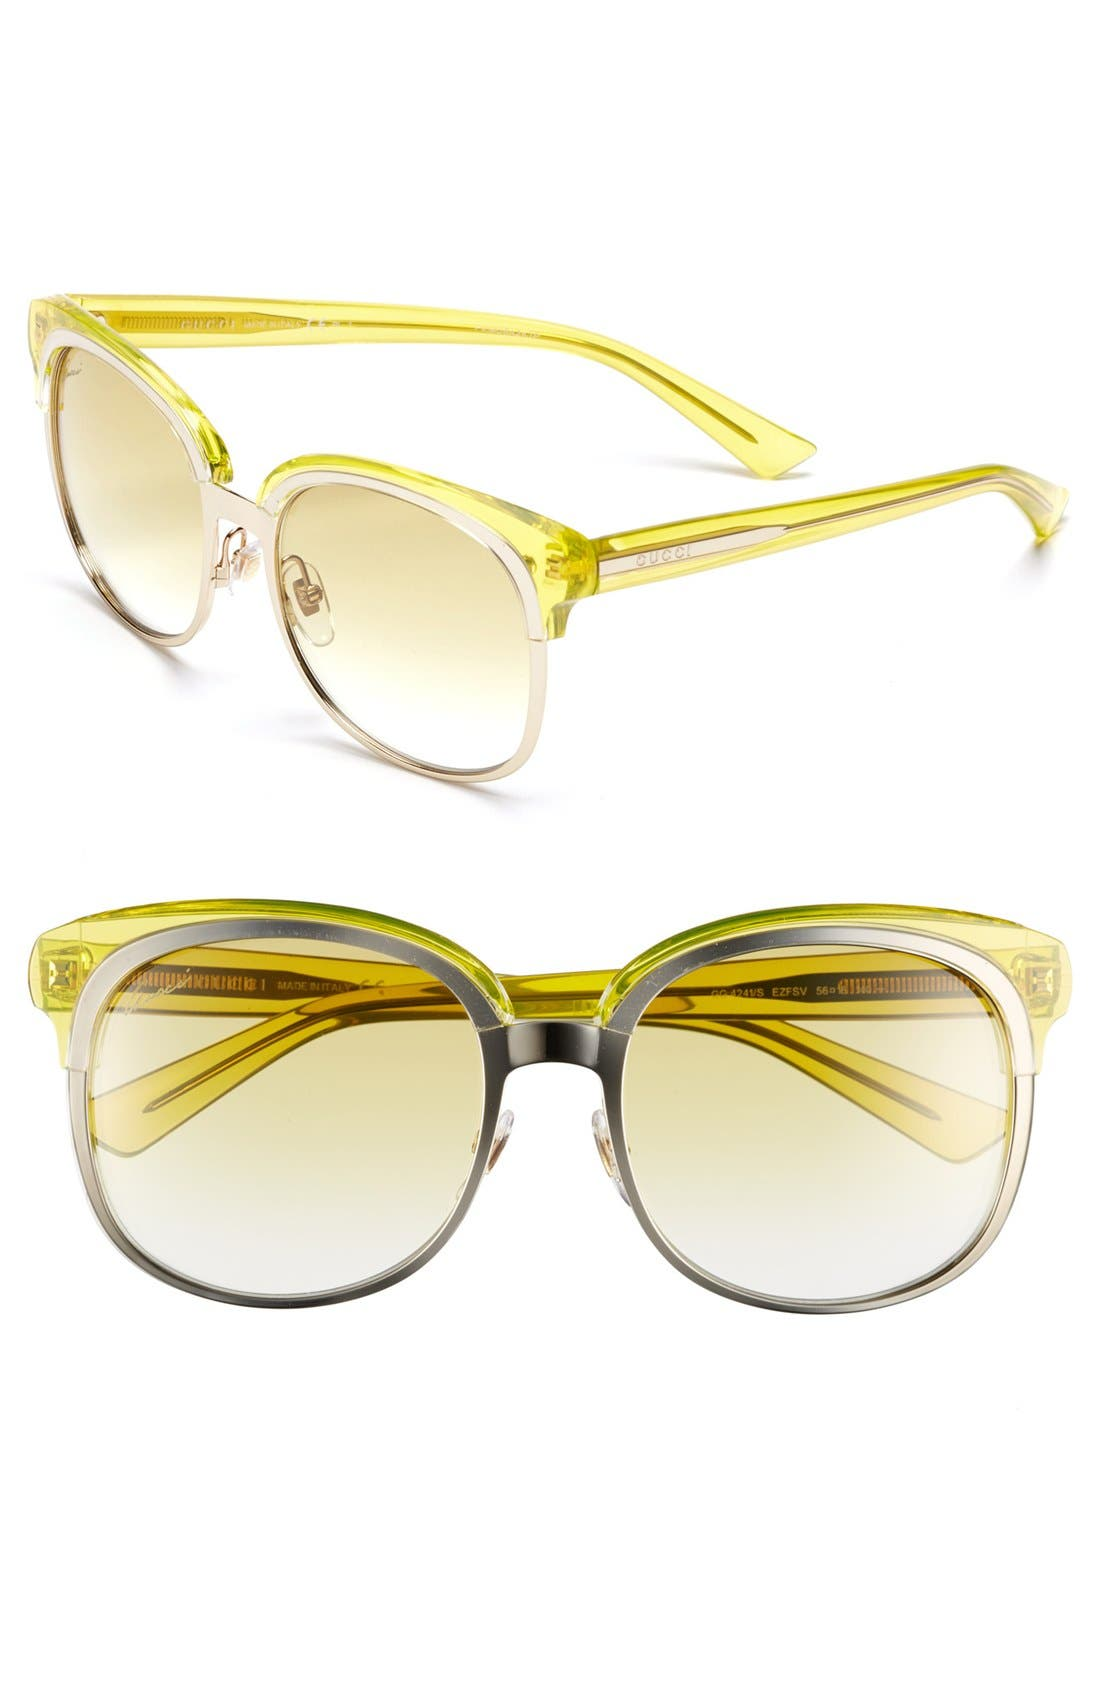 Main Image - Gucci 56mm Sunglasses